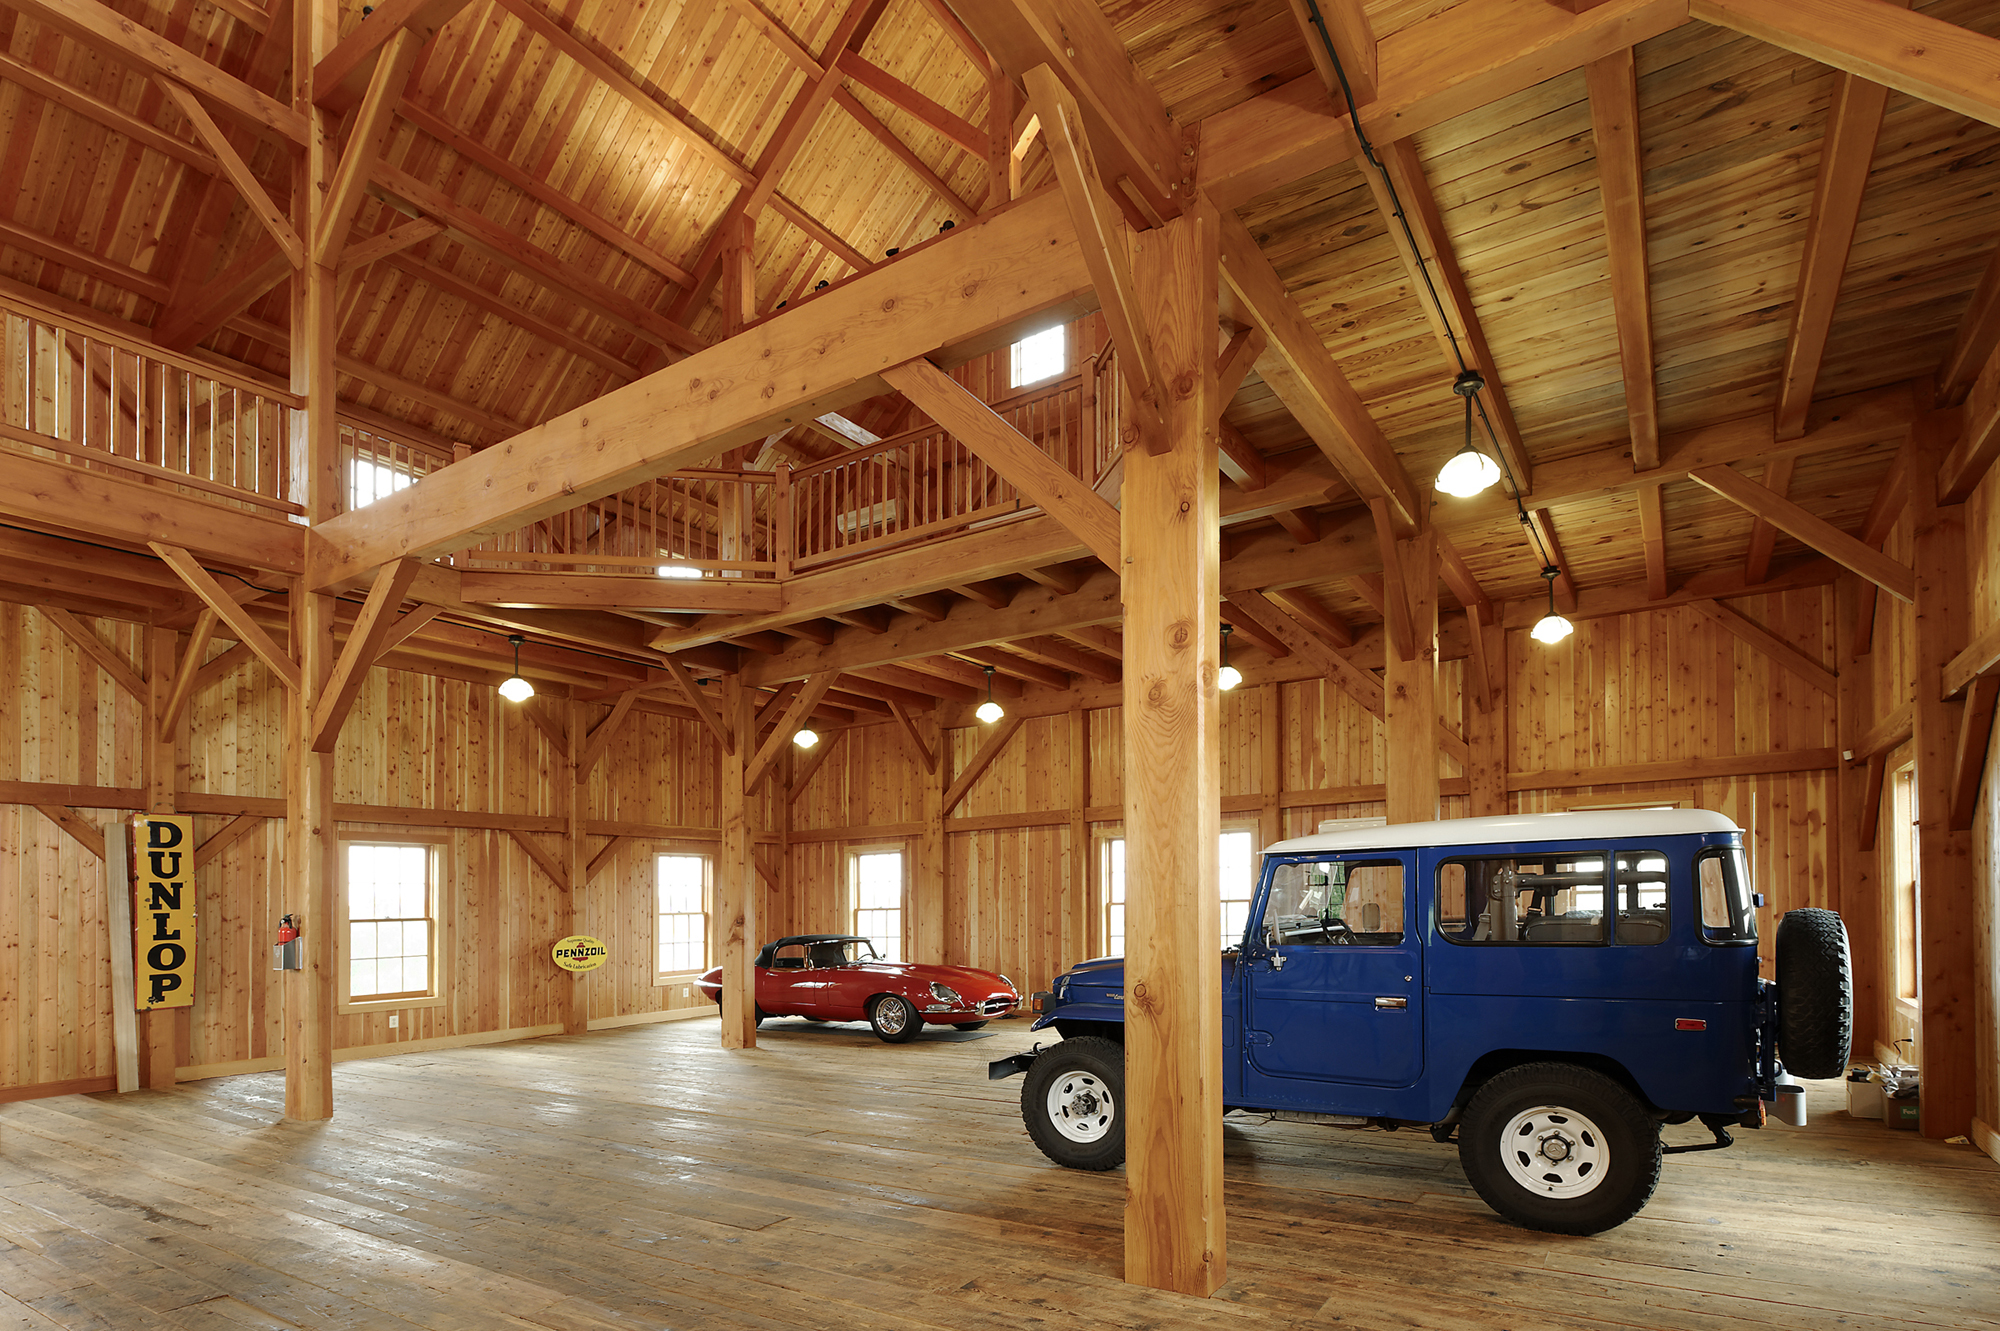 Rustic Timberframe Gallery BOWA